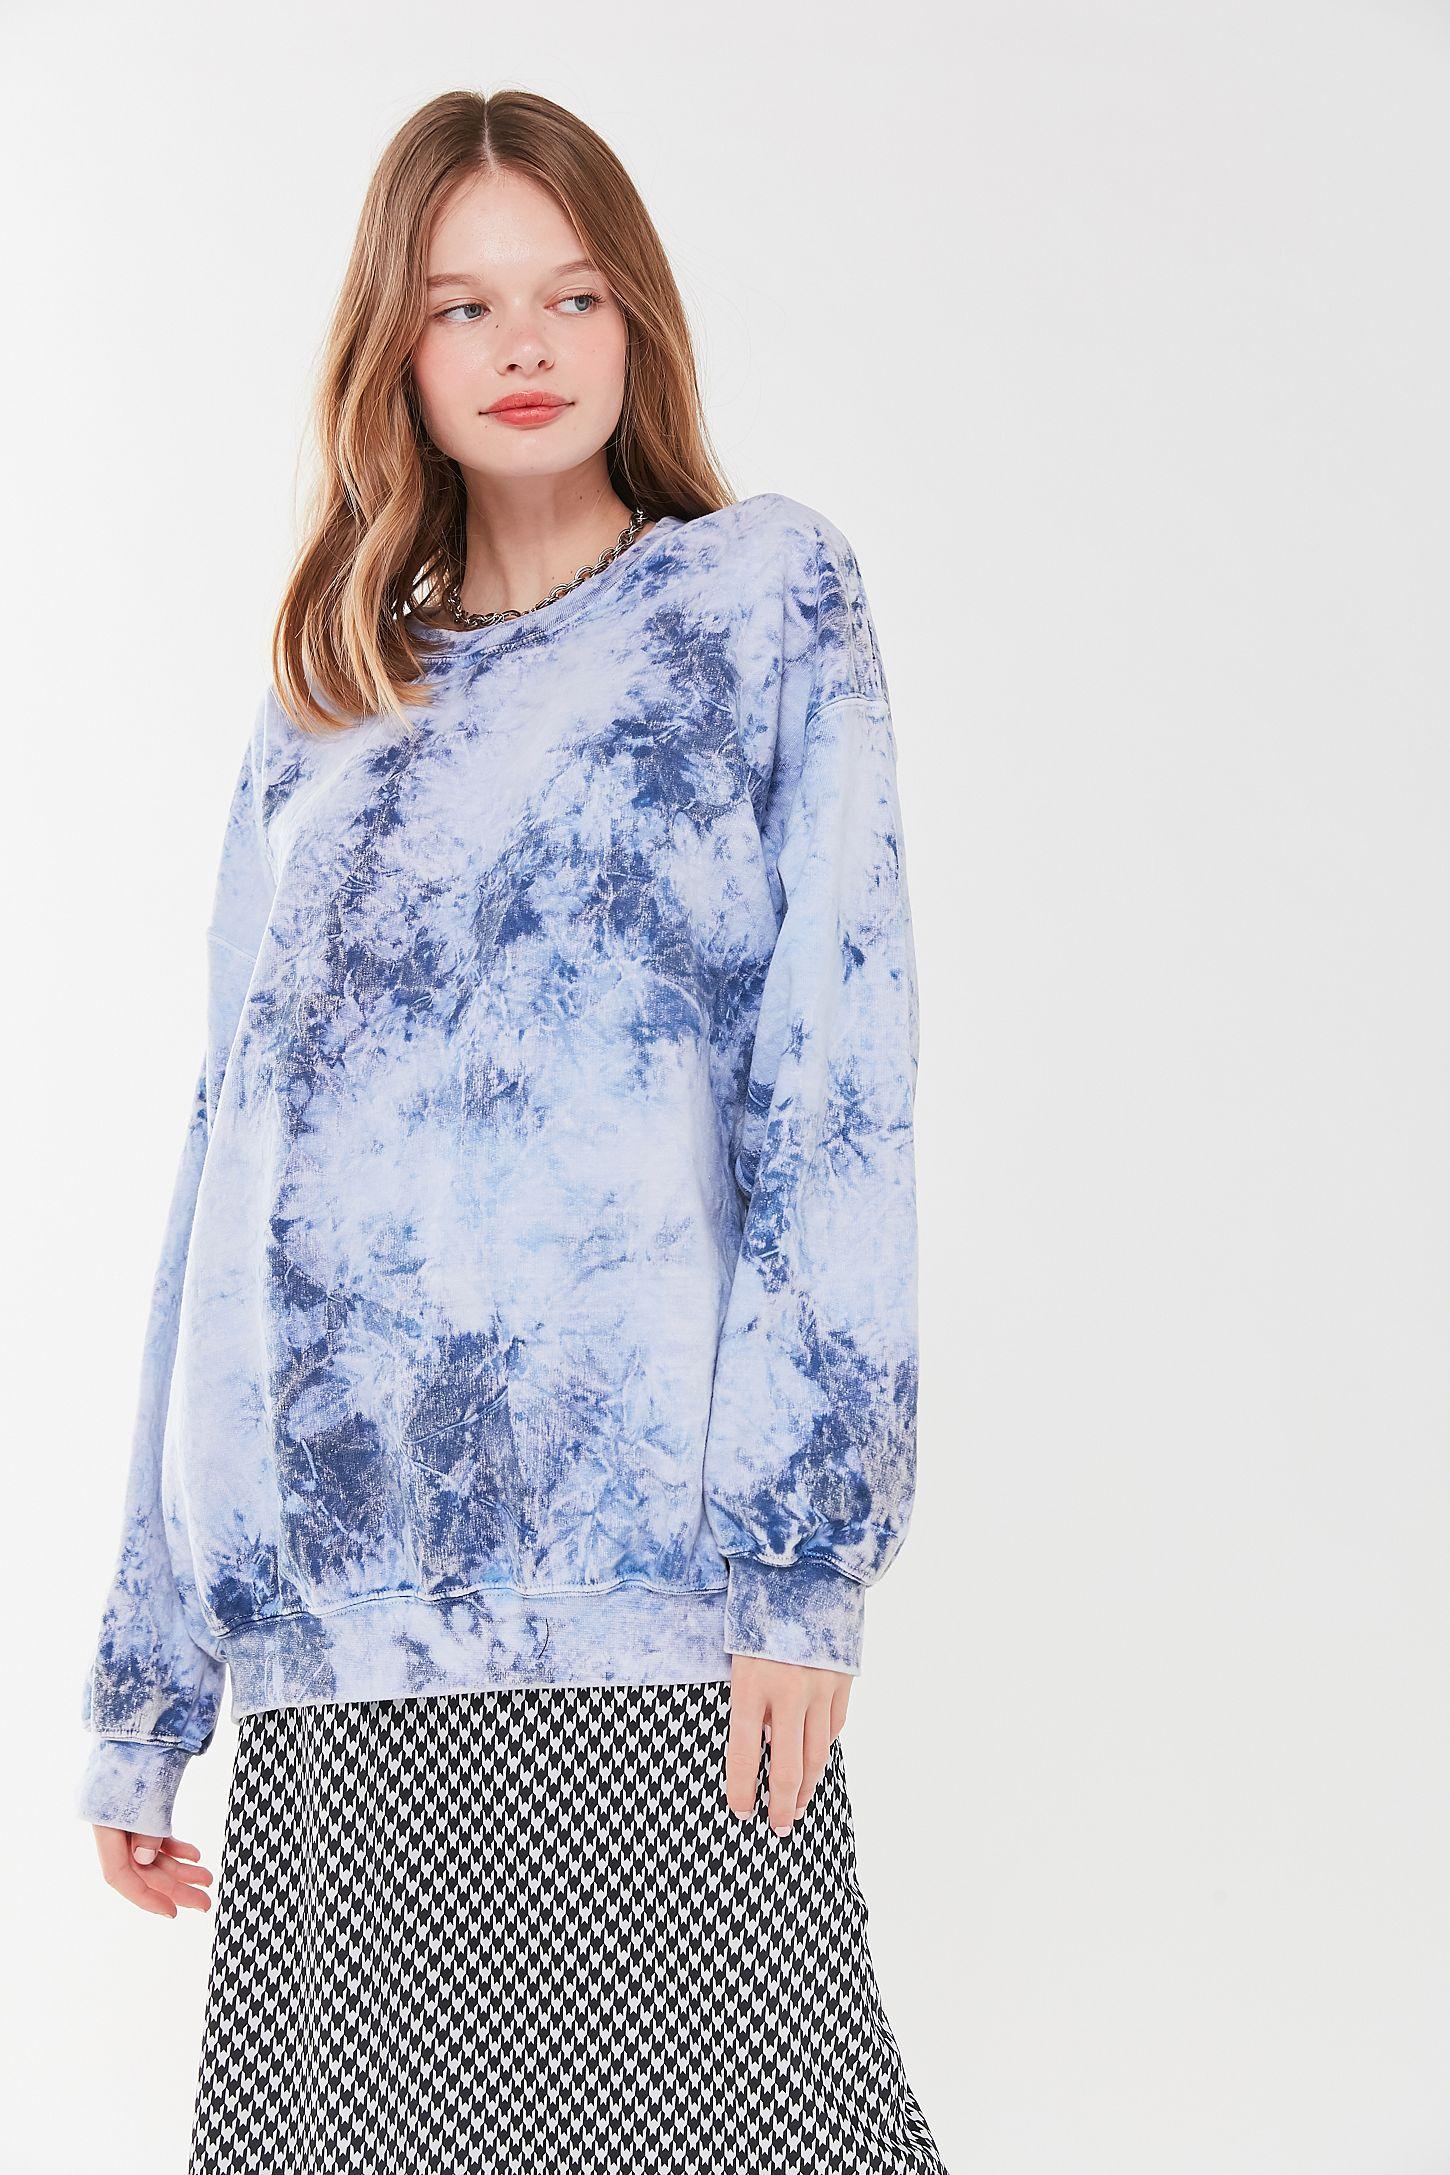 Urban Renewal tie-dyed sweatshirt topdress